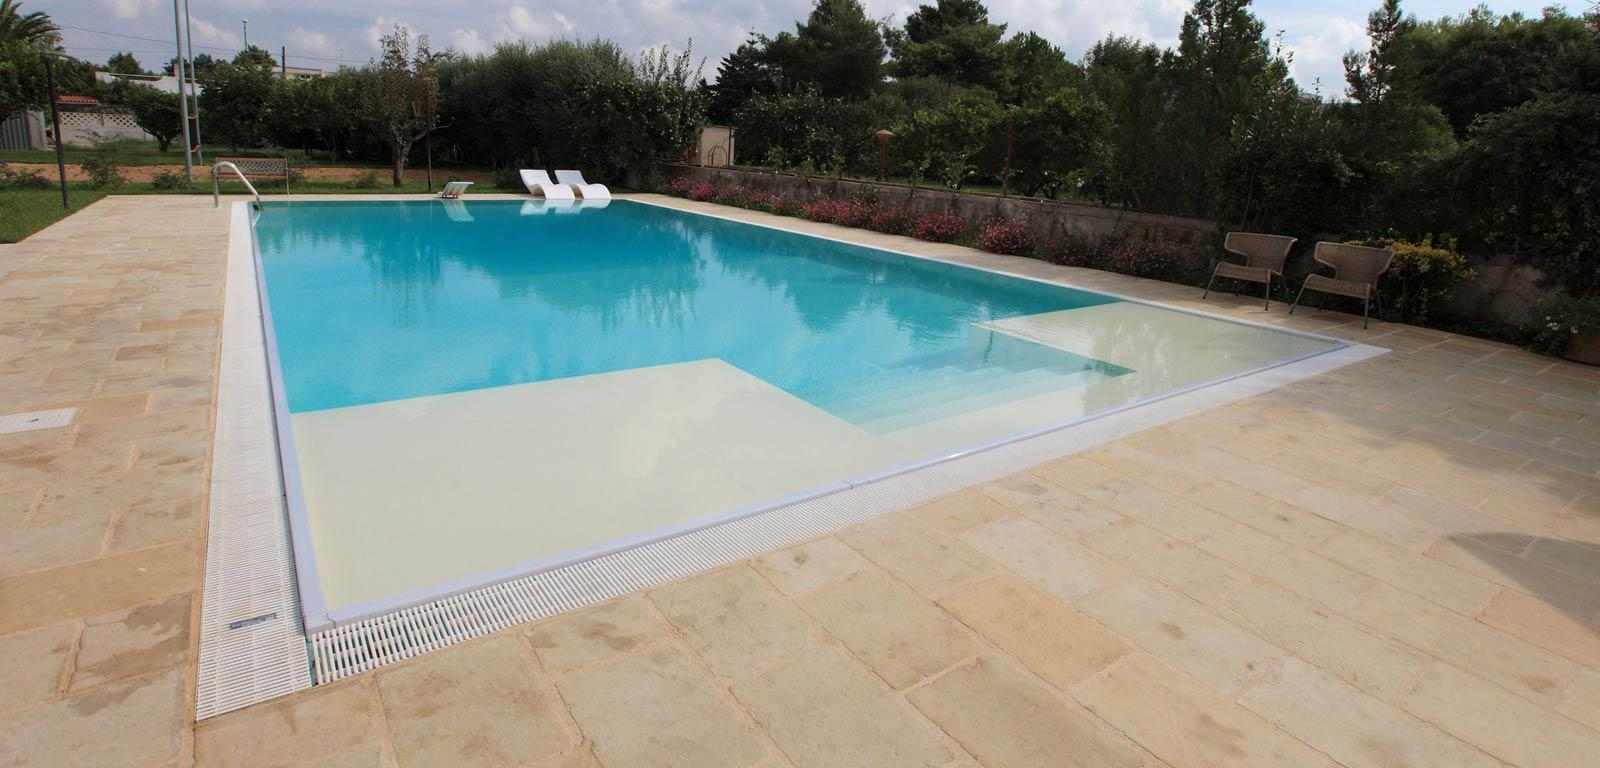 Foto di piscine interrate recinzioni per piscine - Immagini di piscine ...